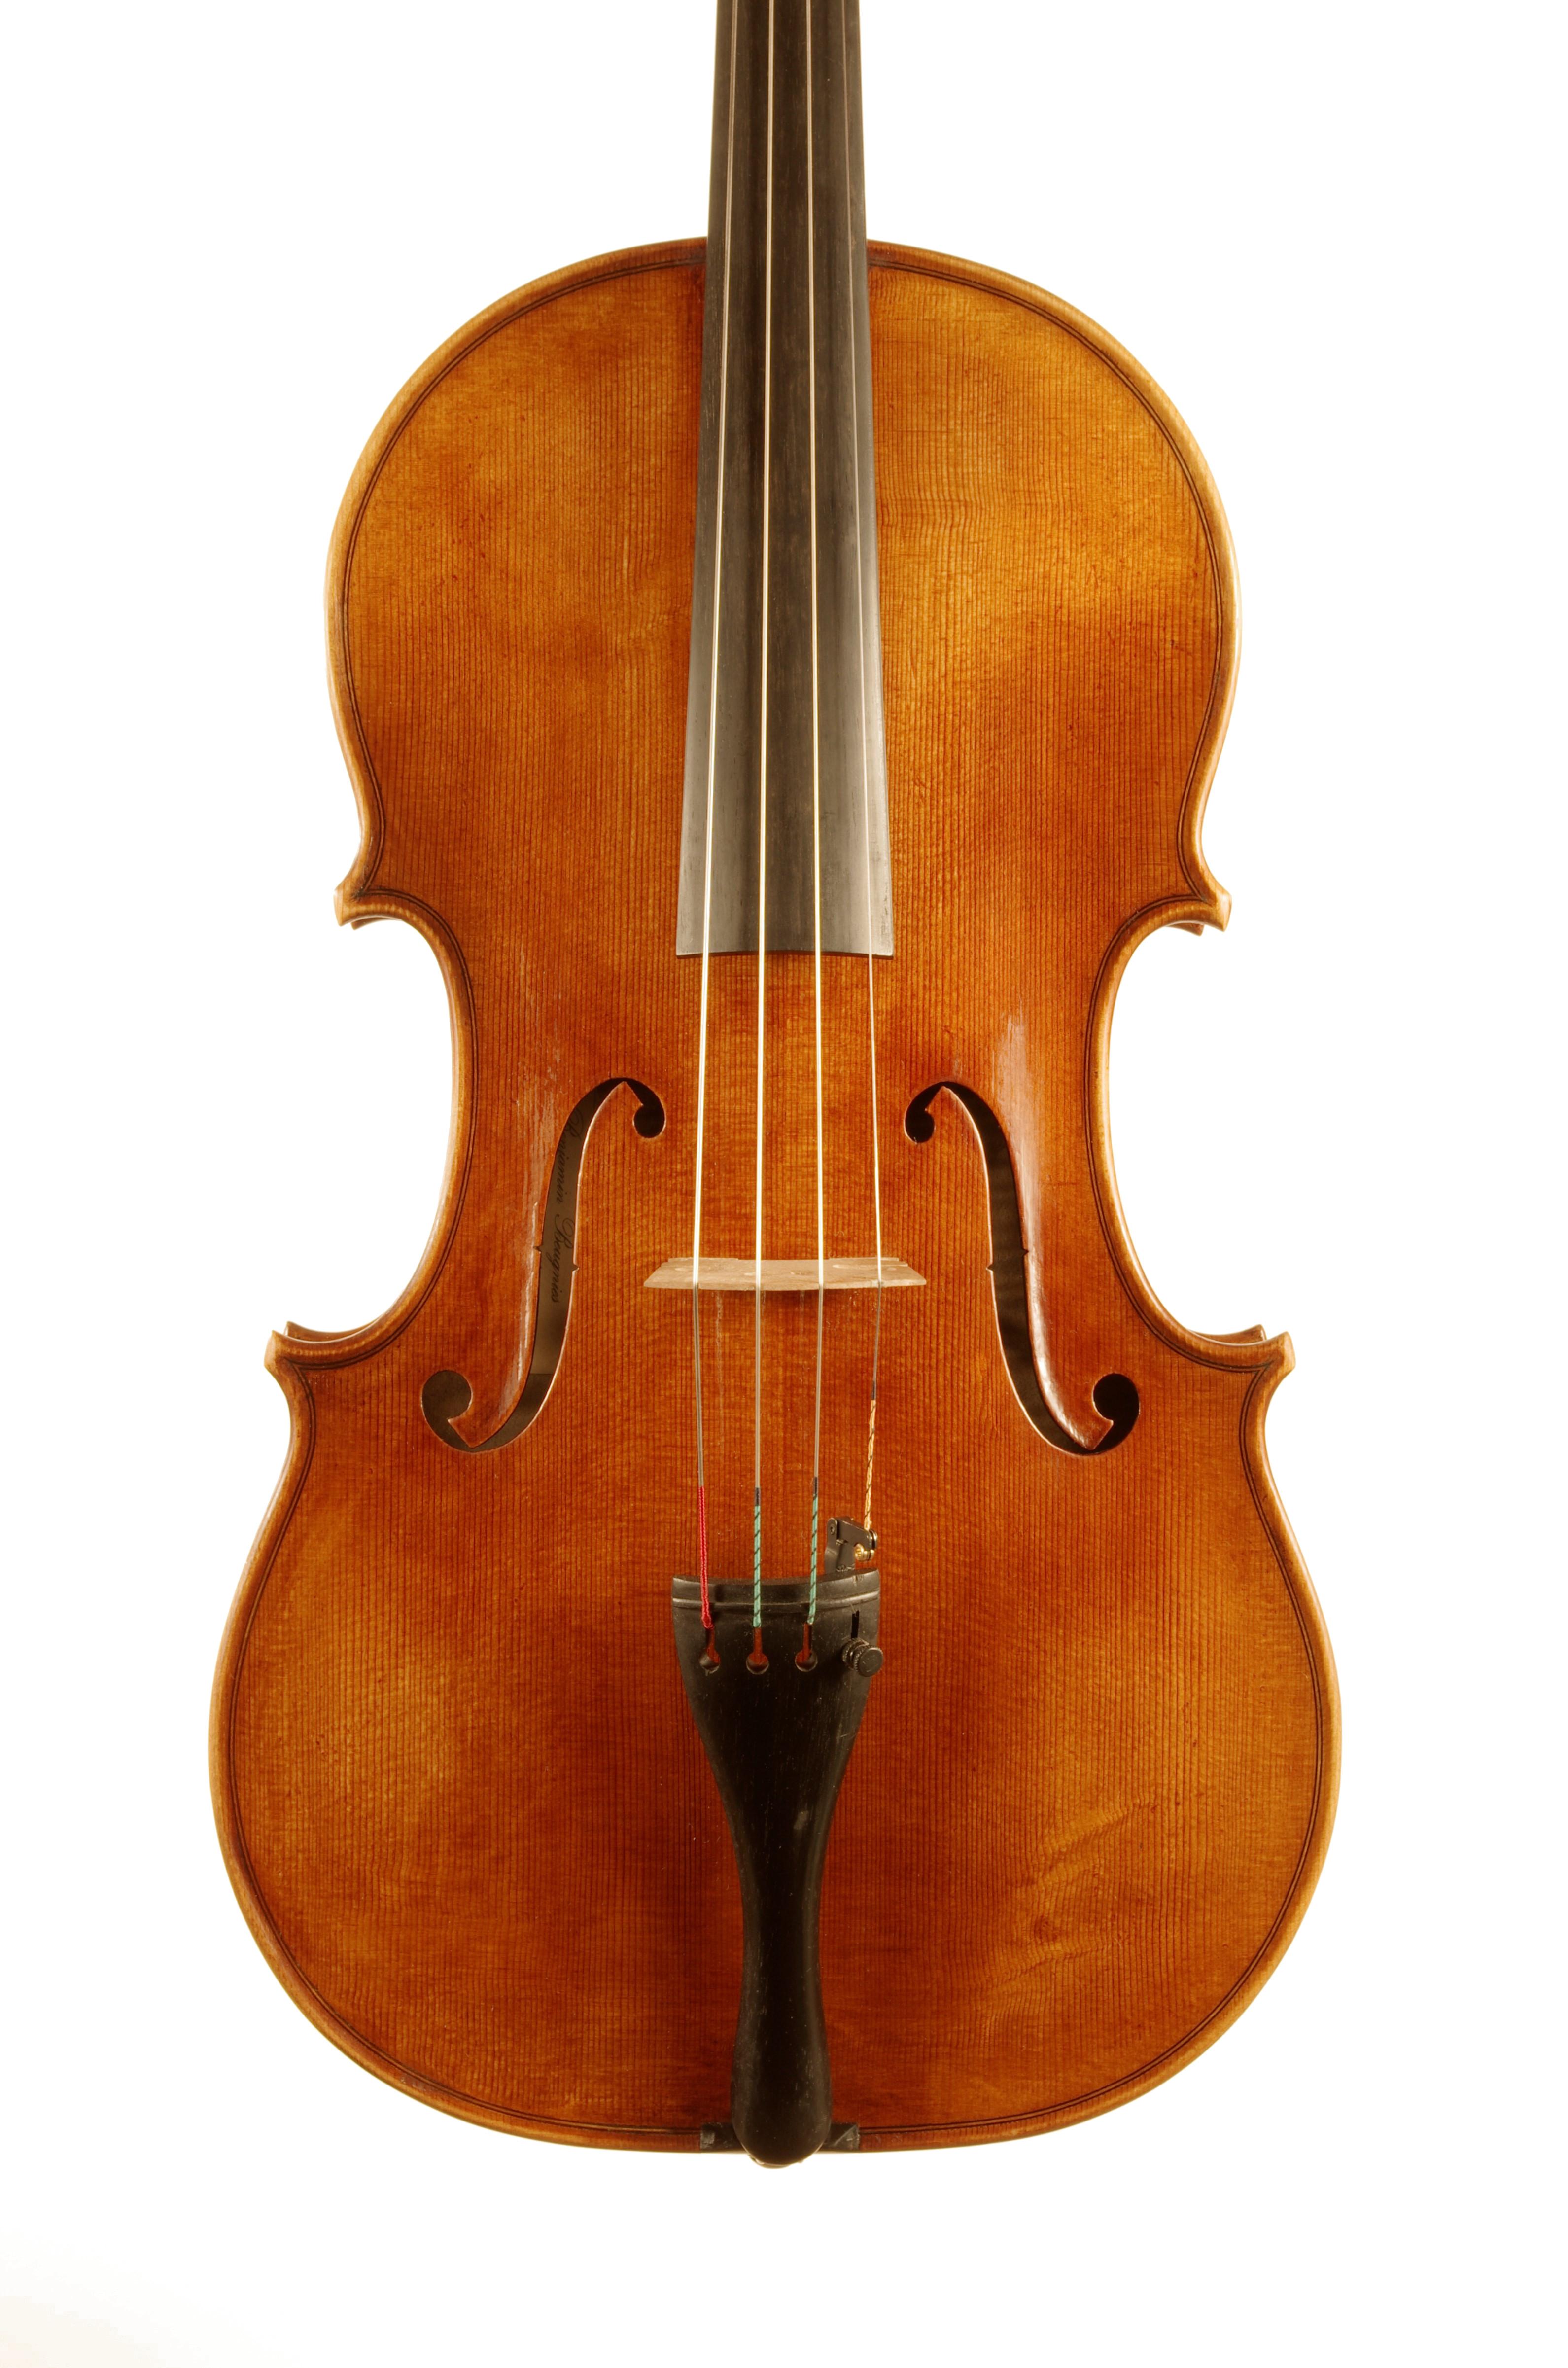 Alto 41.5 - Luthier Benjamin Beugnies